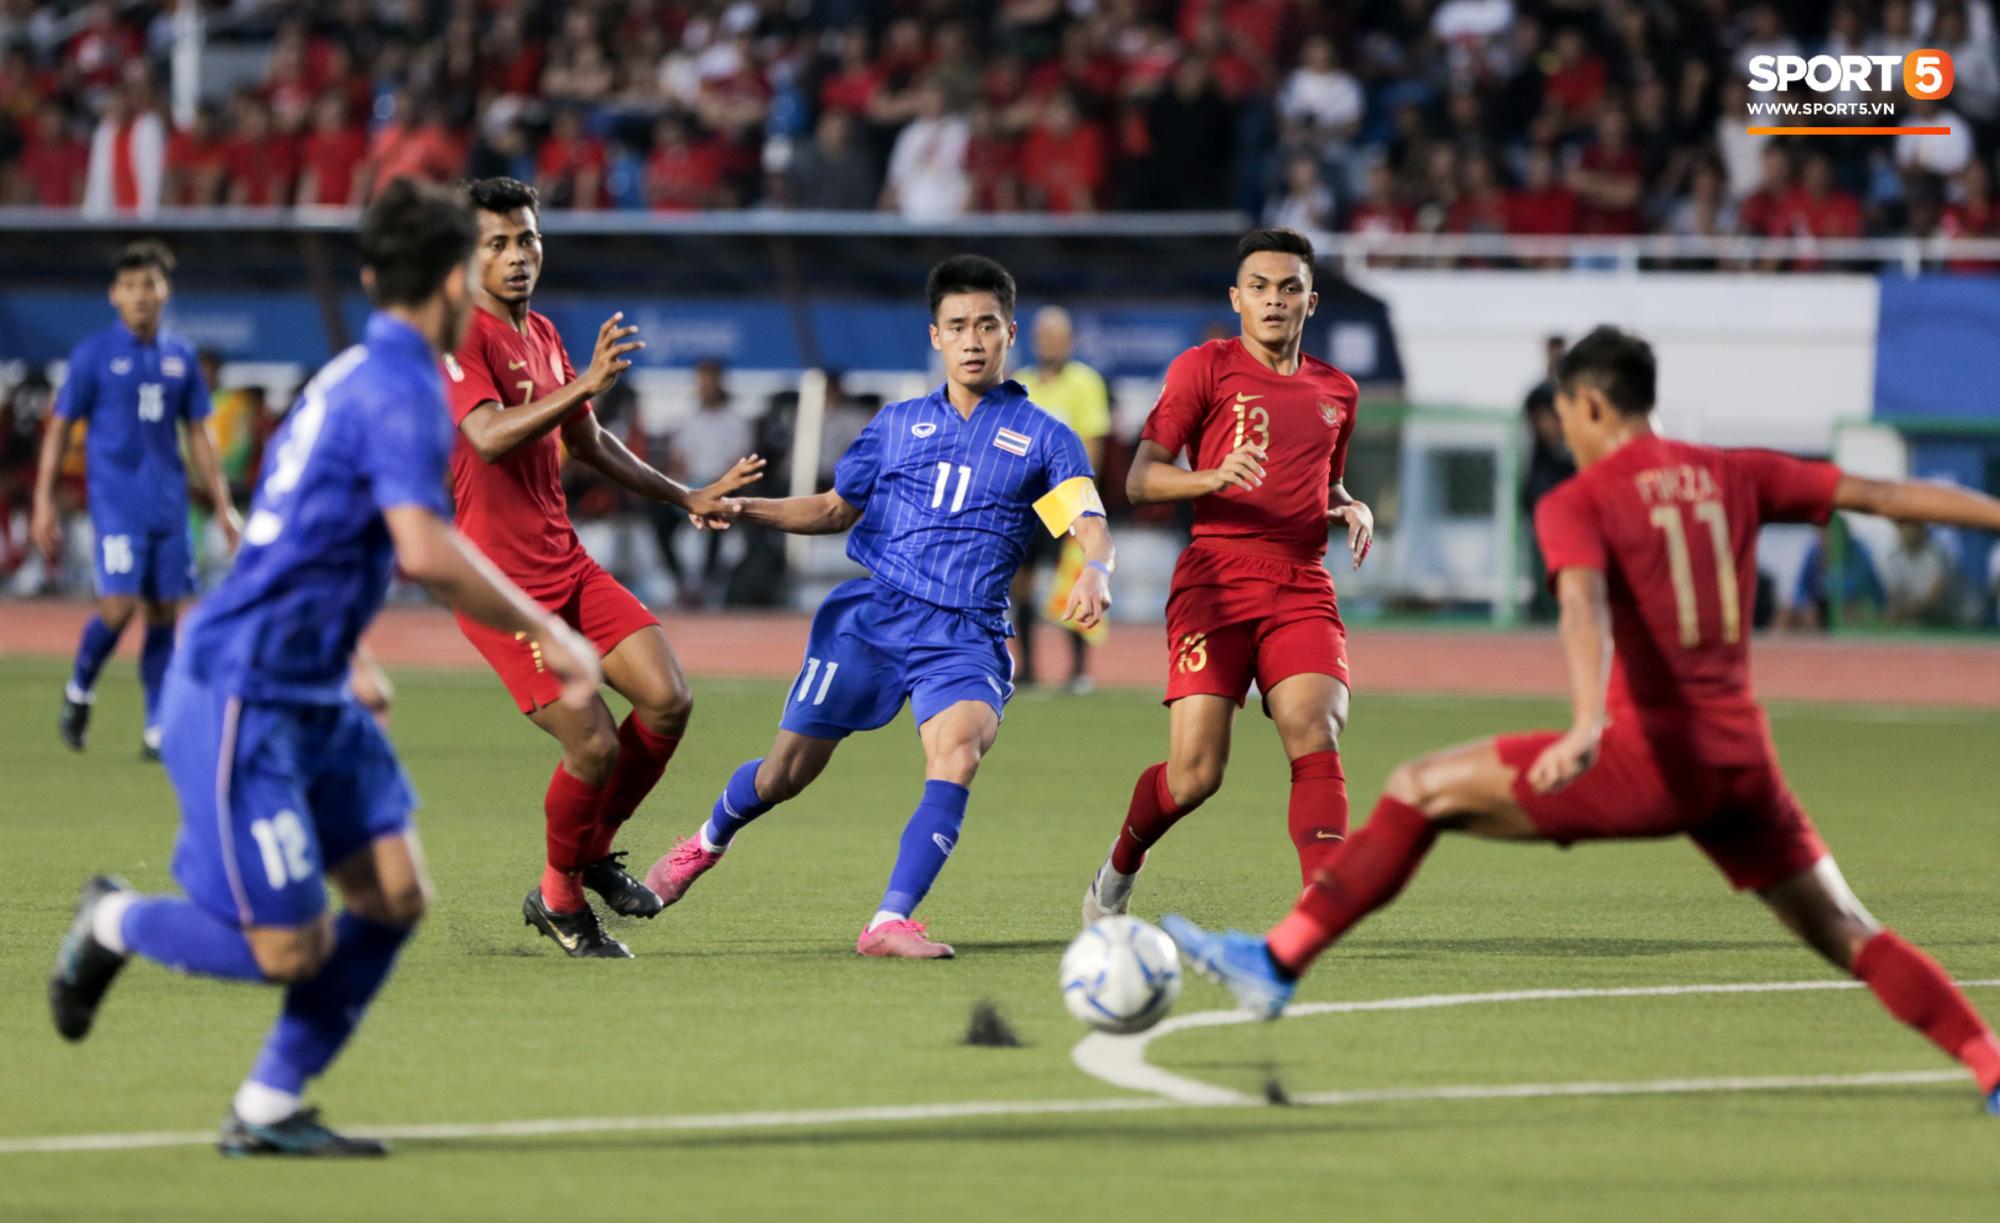 Soi kèo U22 Brunei vs U22 Thái Lan